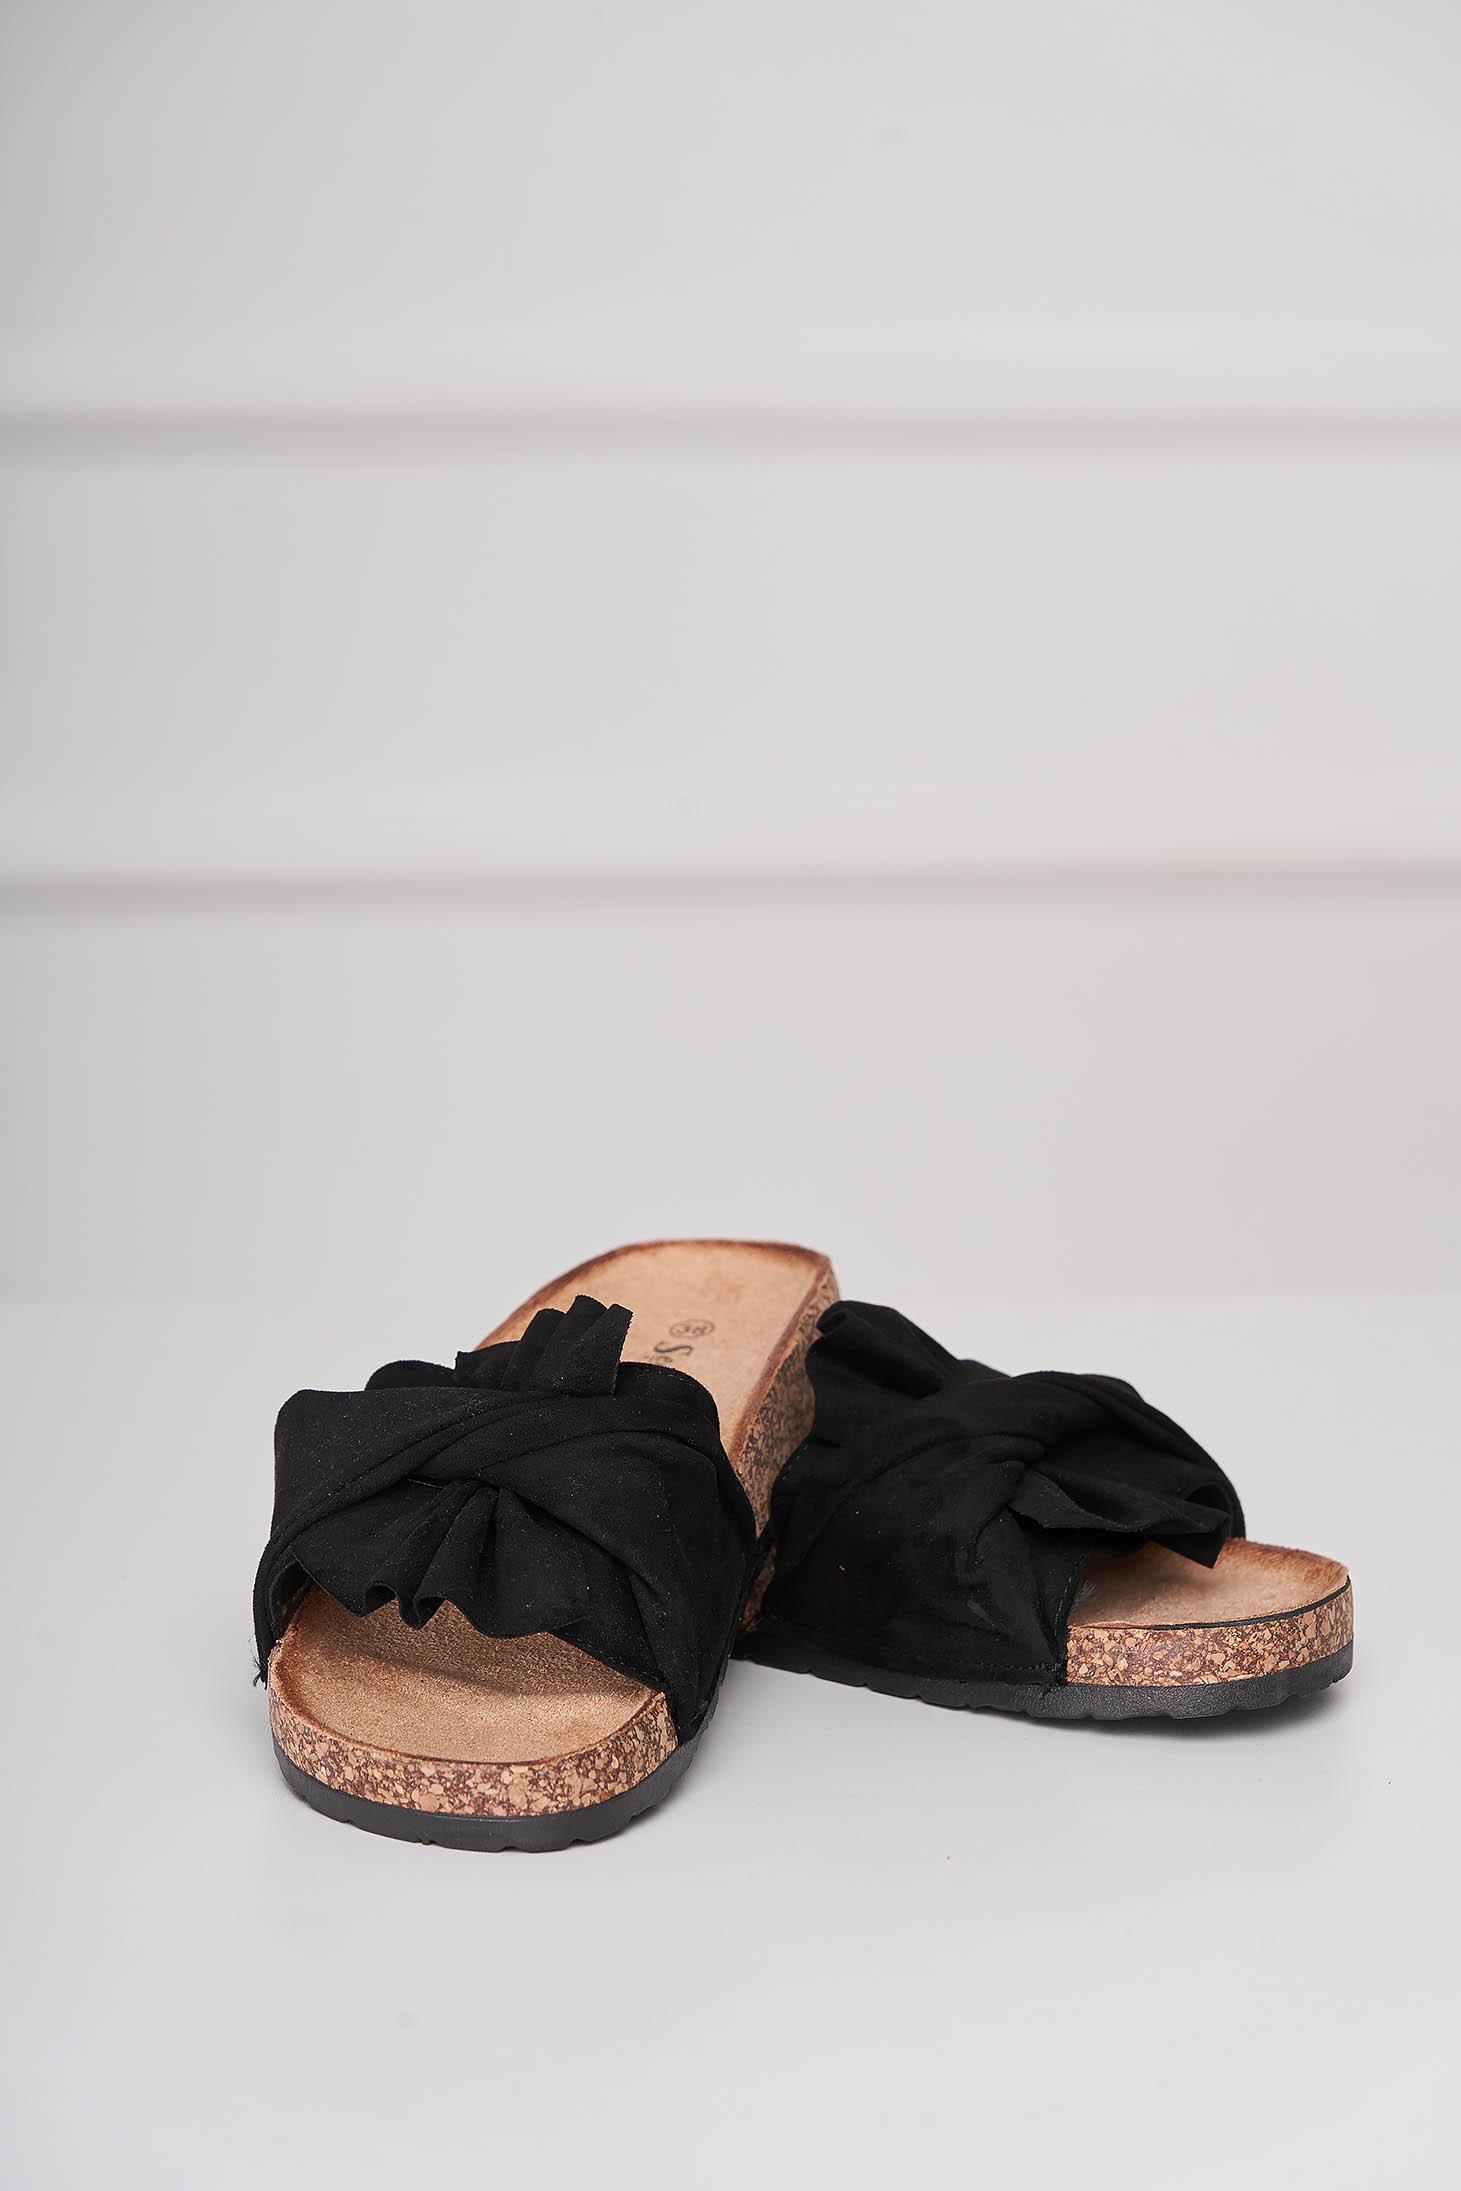 Casual black slippers from velvet fabric low heel